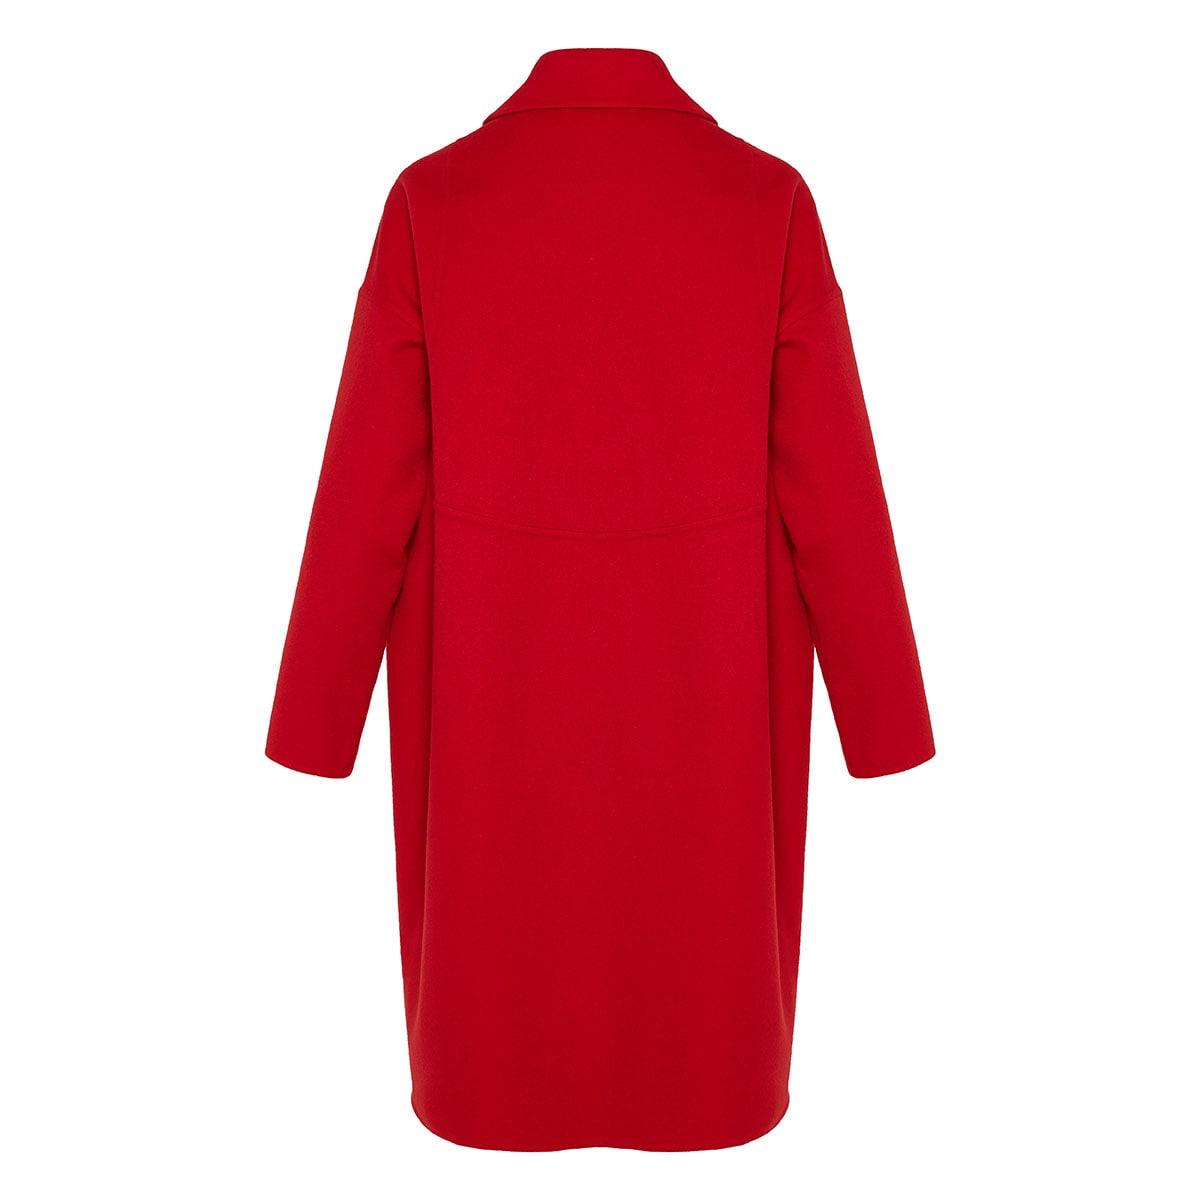 Bilpin oversized wool coat